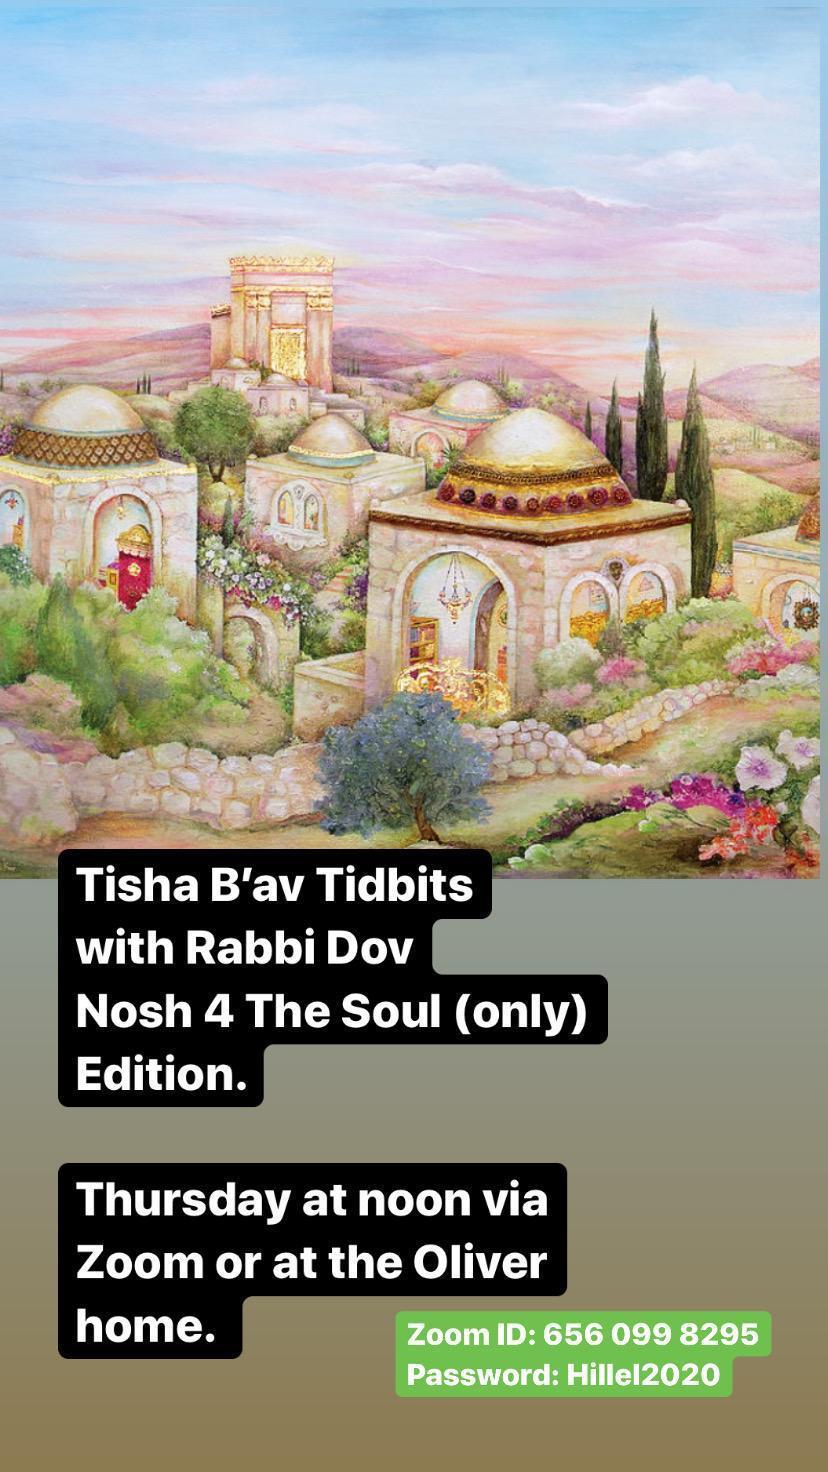 Tisha B'av flyer